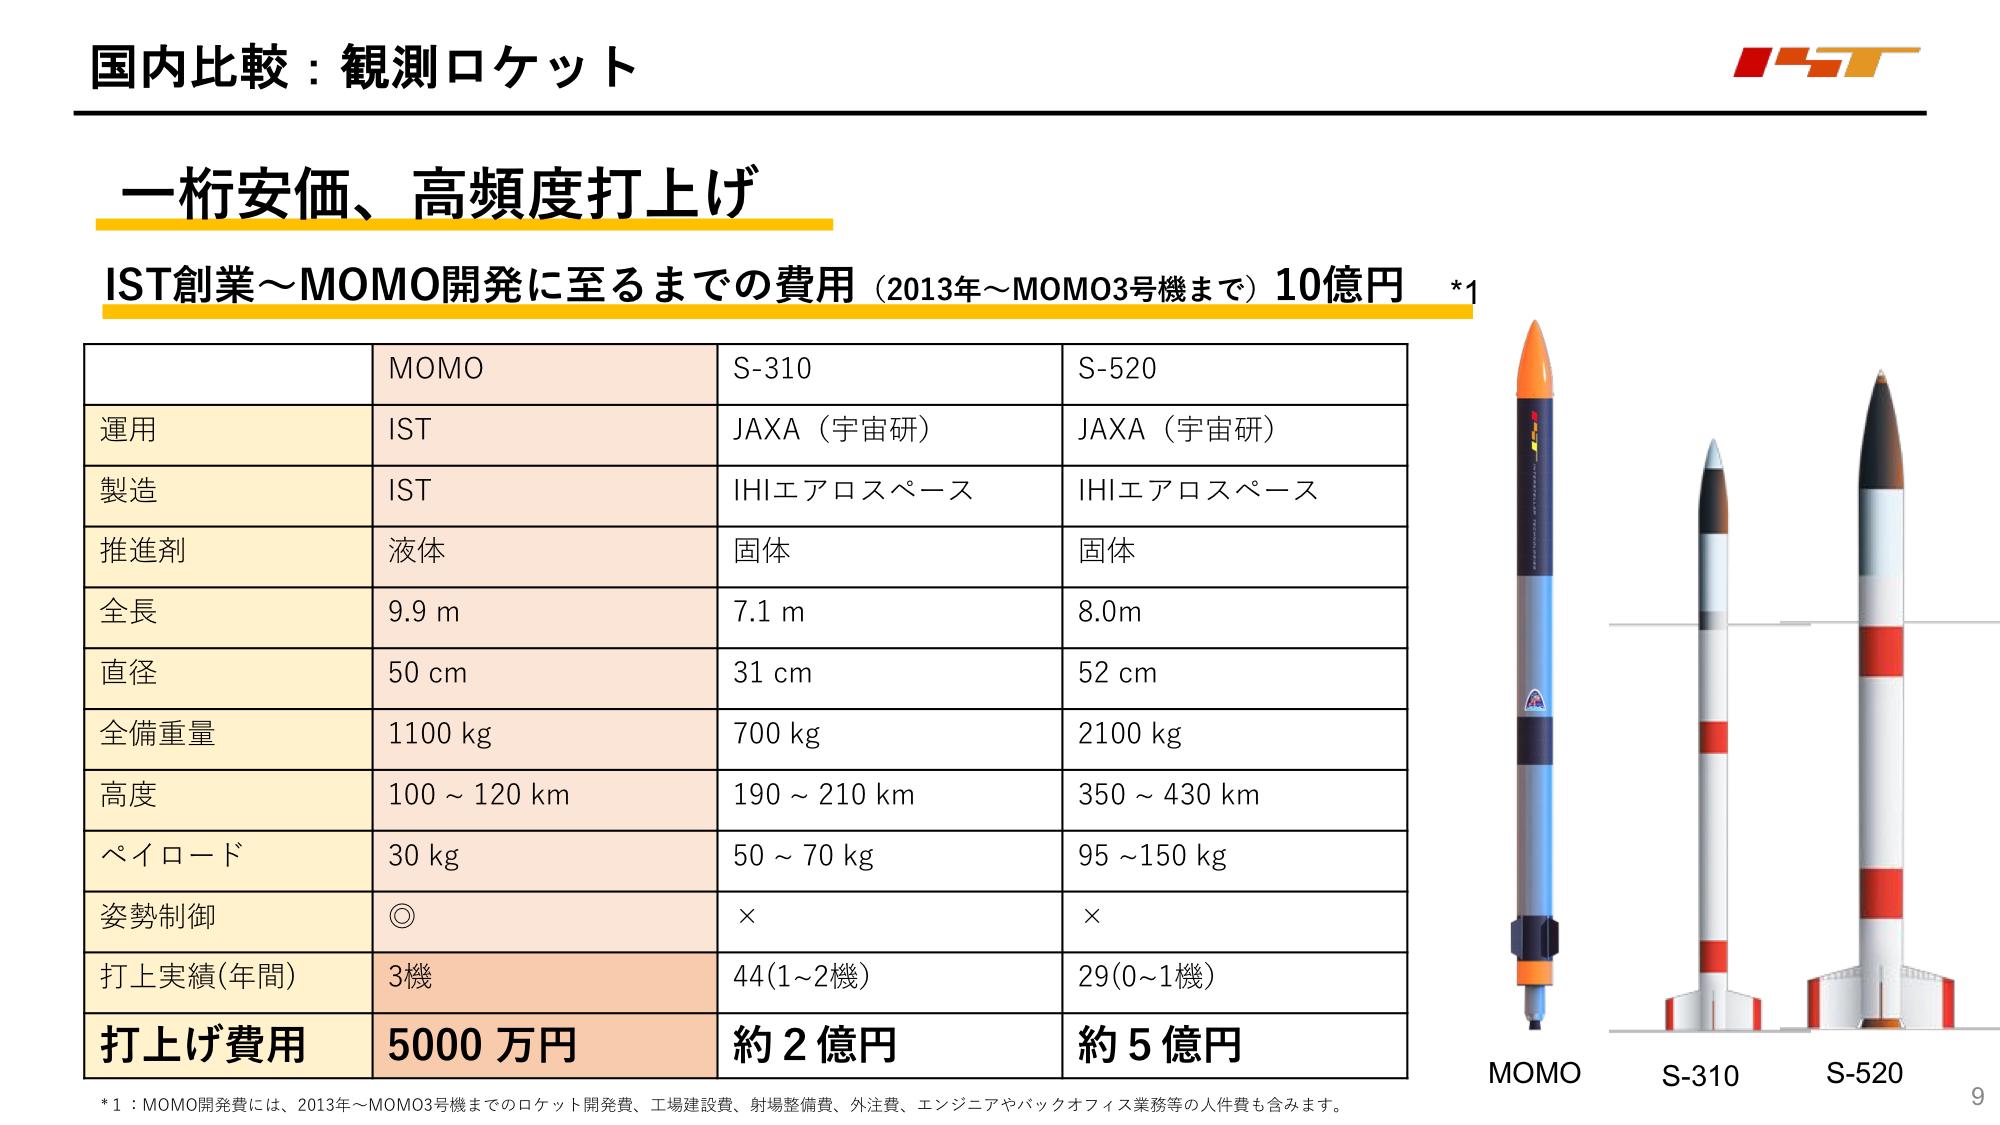 f:id:Imamura:20191126135050p:plain